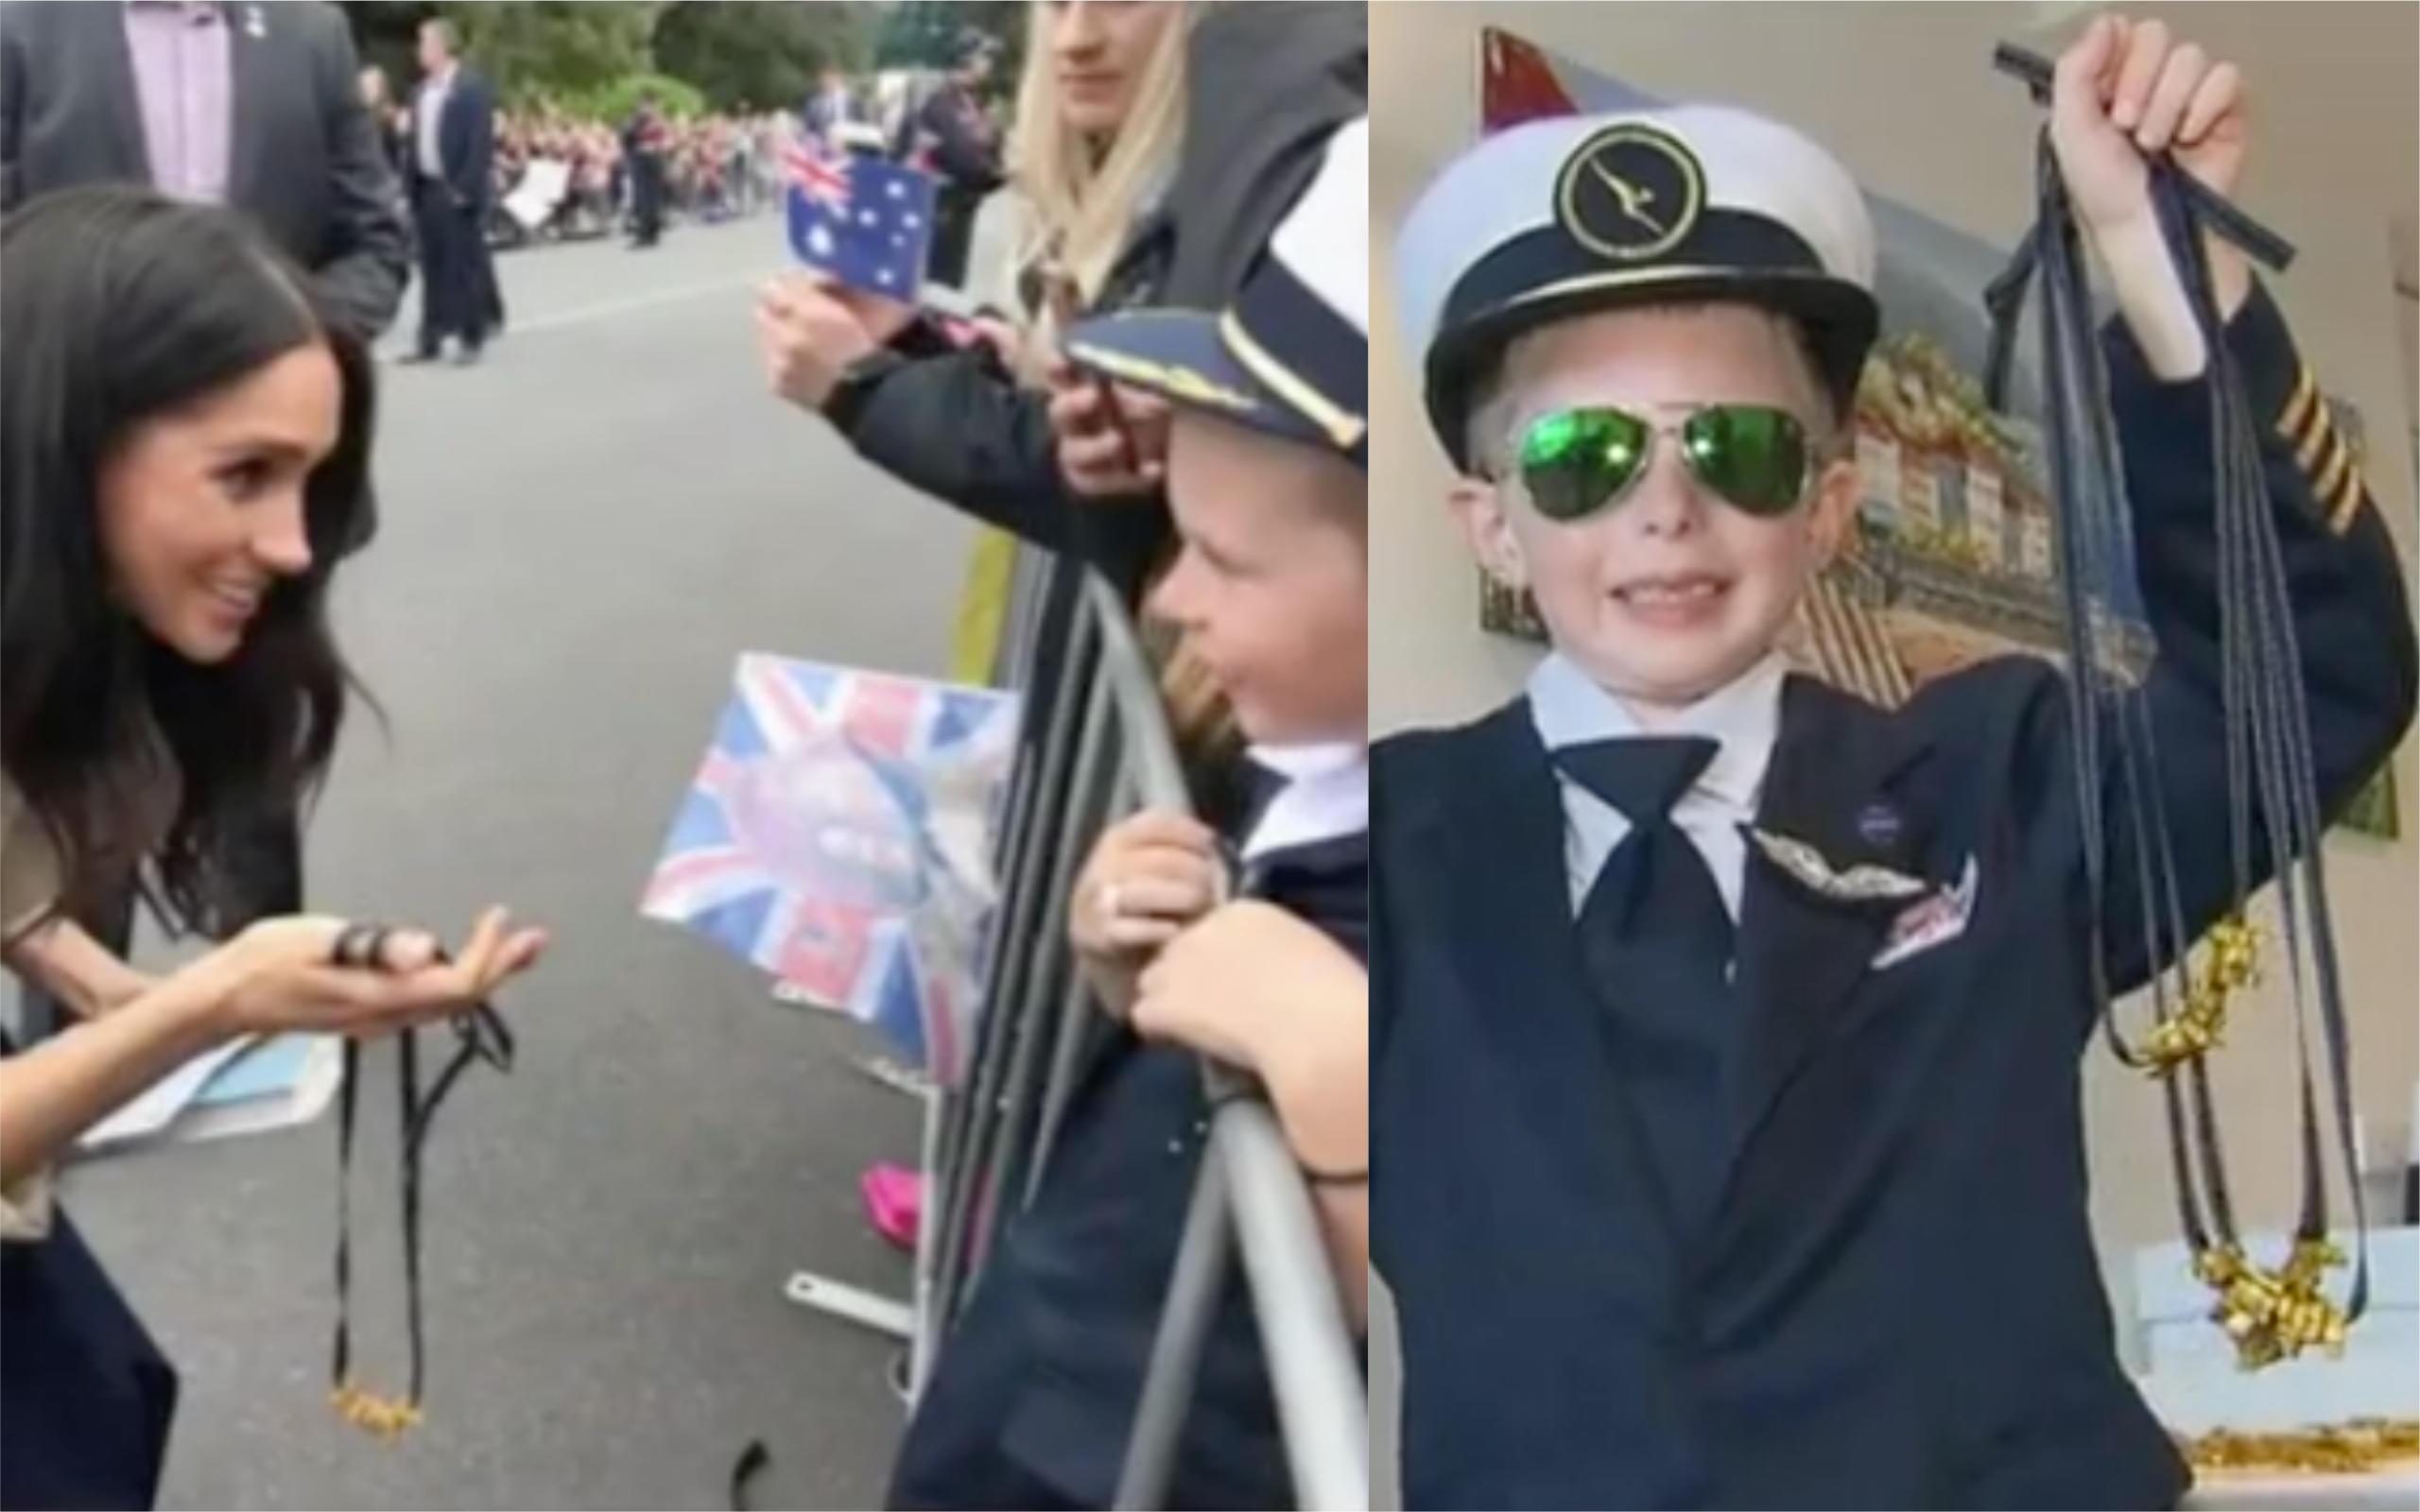 Gavin Hazelwood 6 Year Old Boy From Melbourne Australia Gave